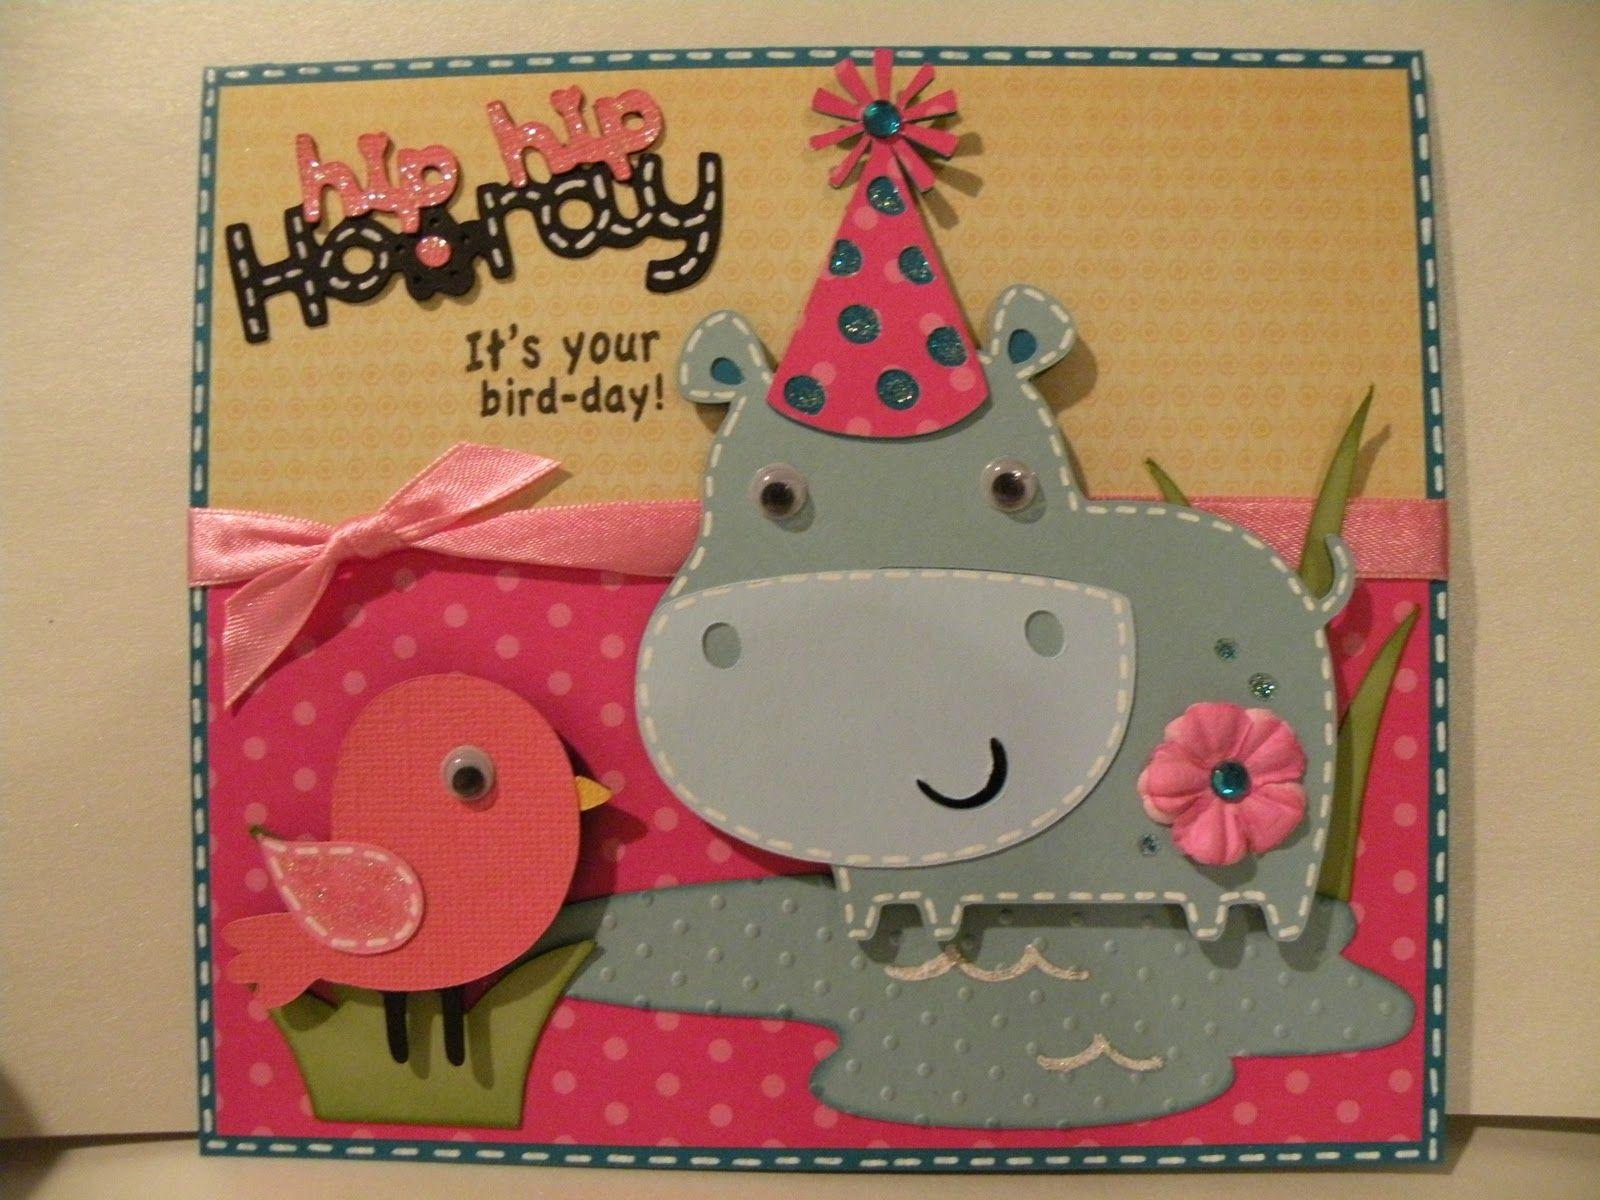 Cute Birthday Card Cricut Birthday Cards Pinterest Cards Simple Birthday Cards